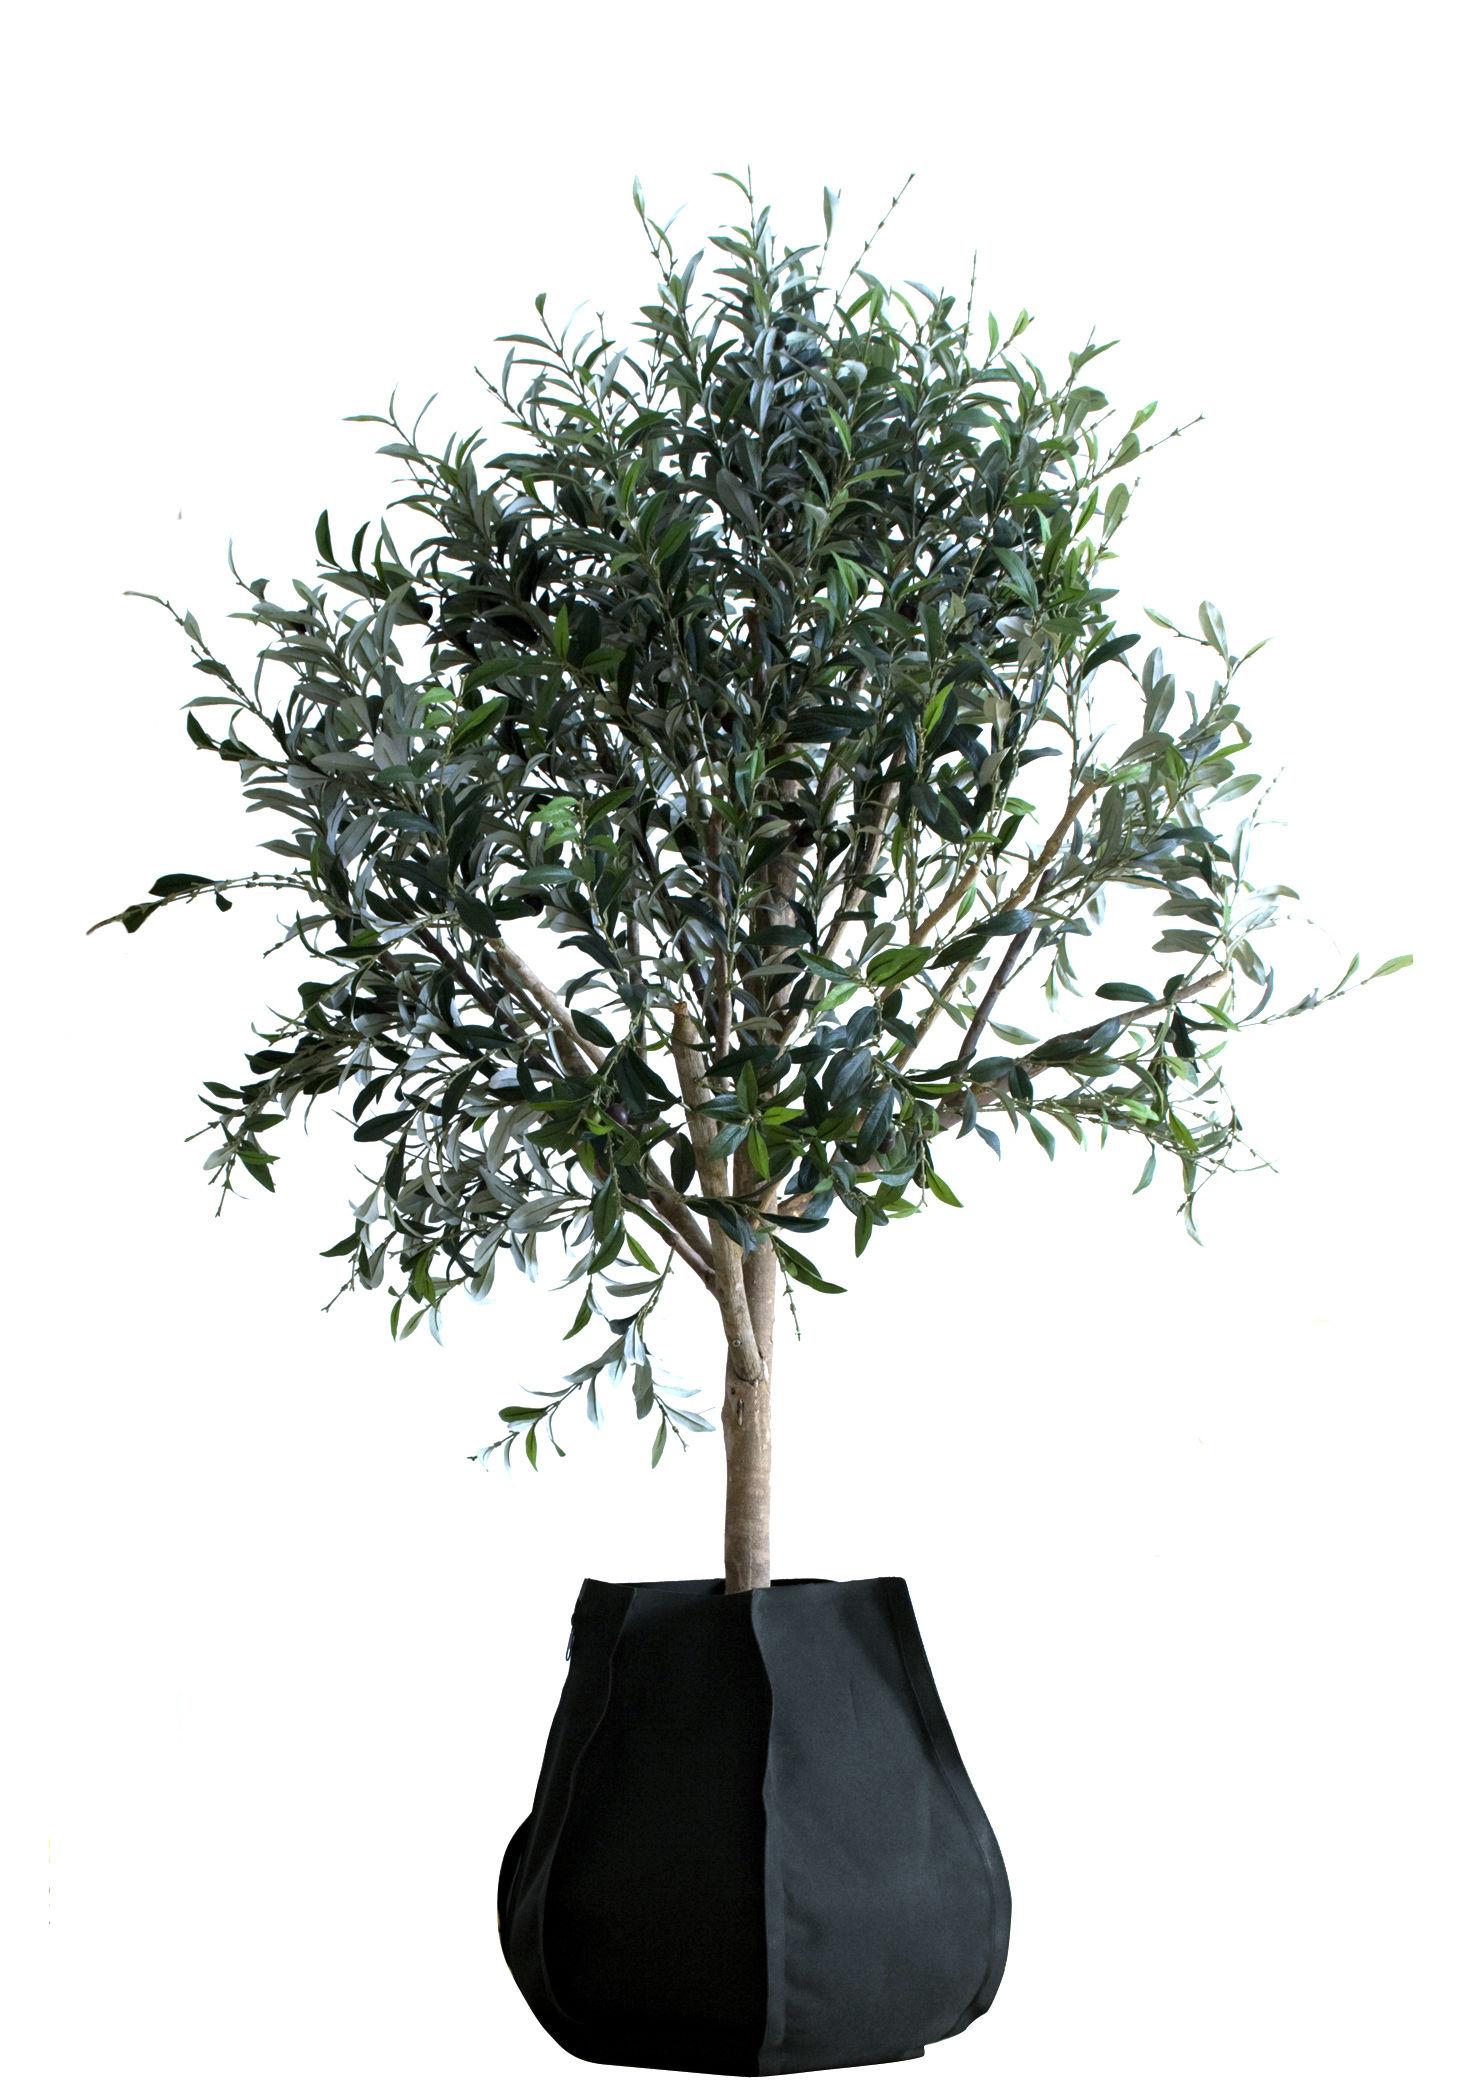 Outdoor - Pots et plantes - Pot de fleurs Urban Garden Sack / Medium - 15 litres - Authentics - Kaki foncé - Tissu polyester